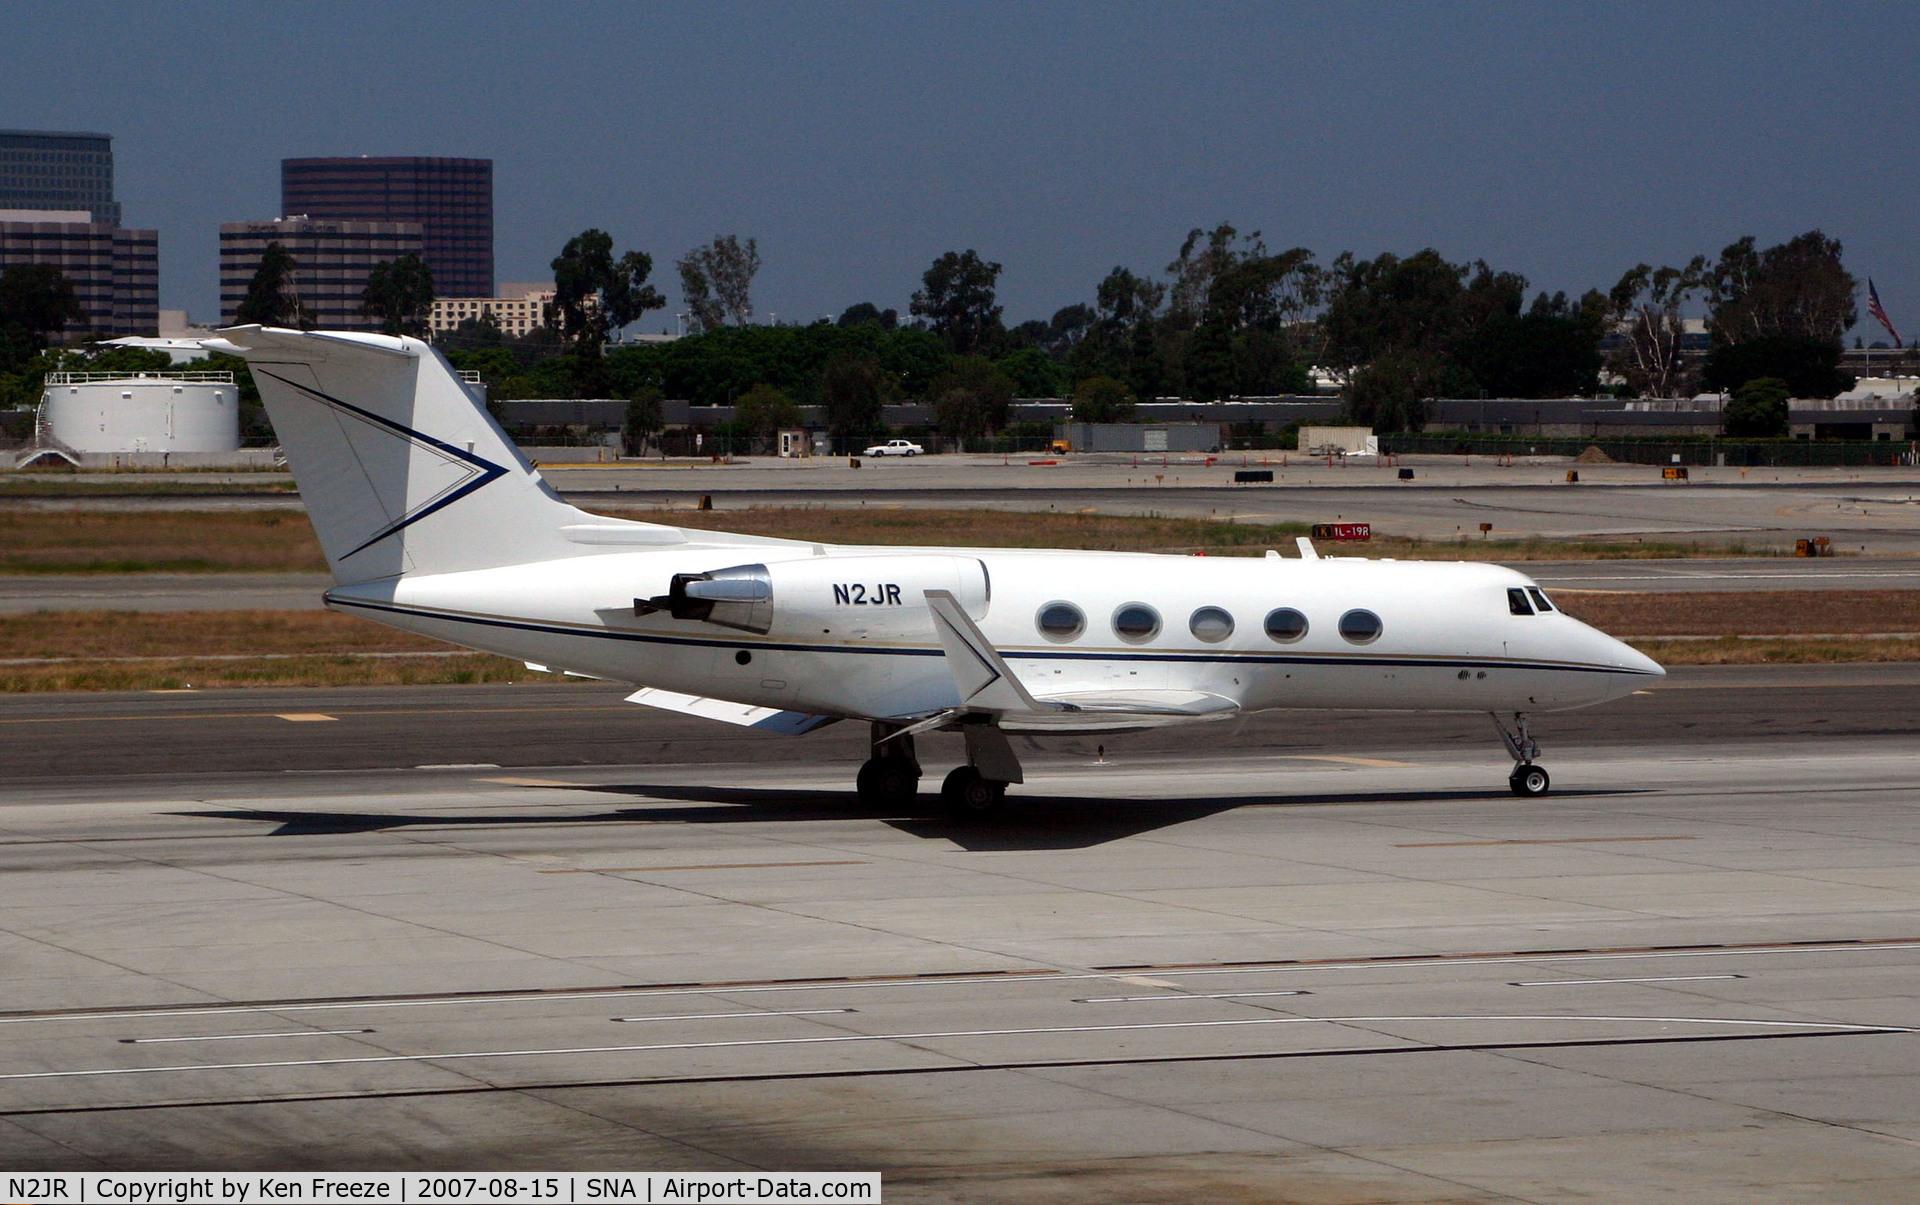 N2JR, 1973 Grumman G-1159B Gulfstream II C/N 131, At John Wayne Airport